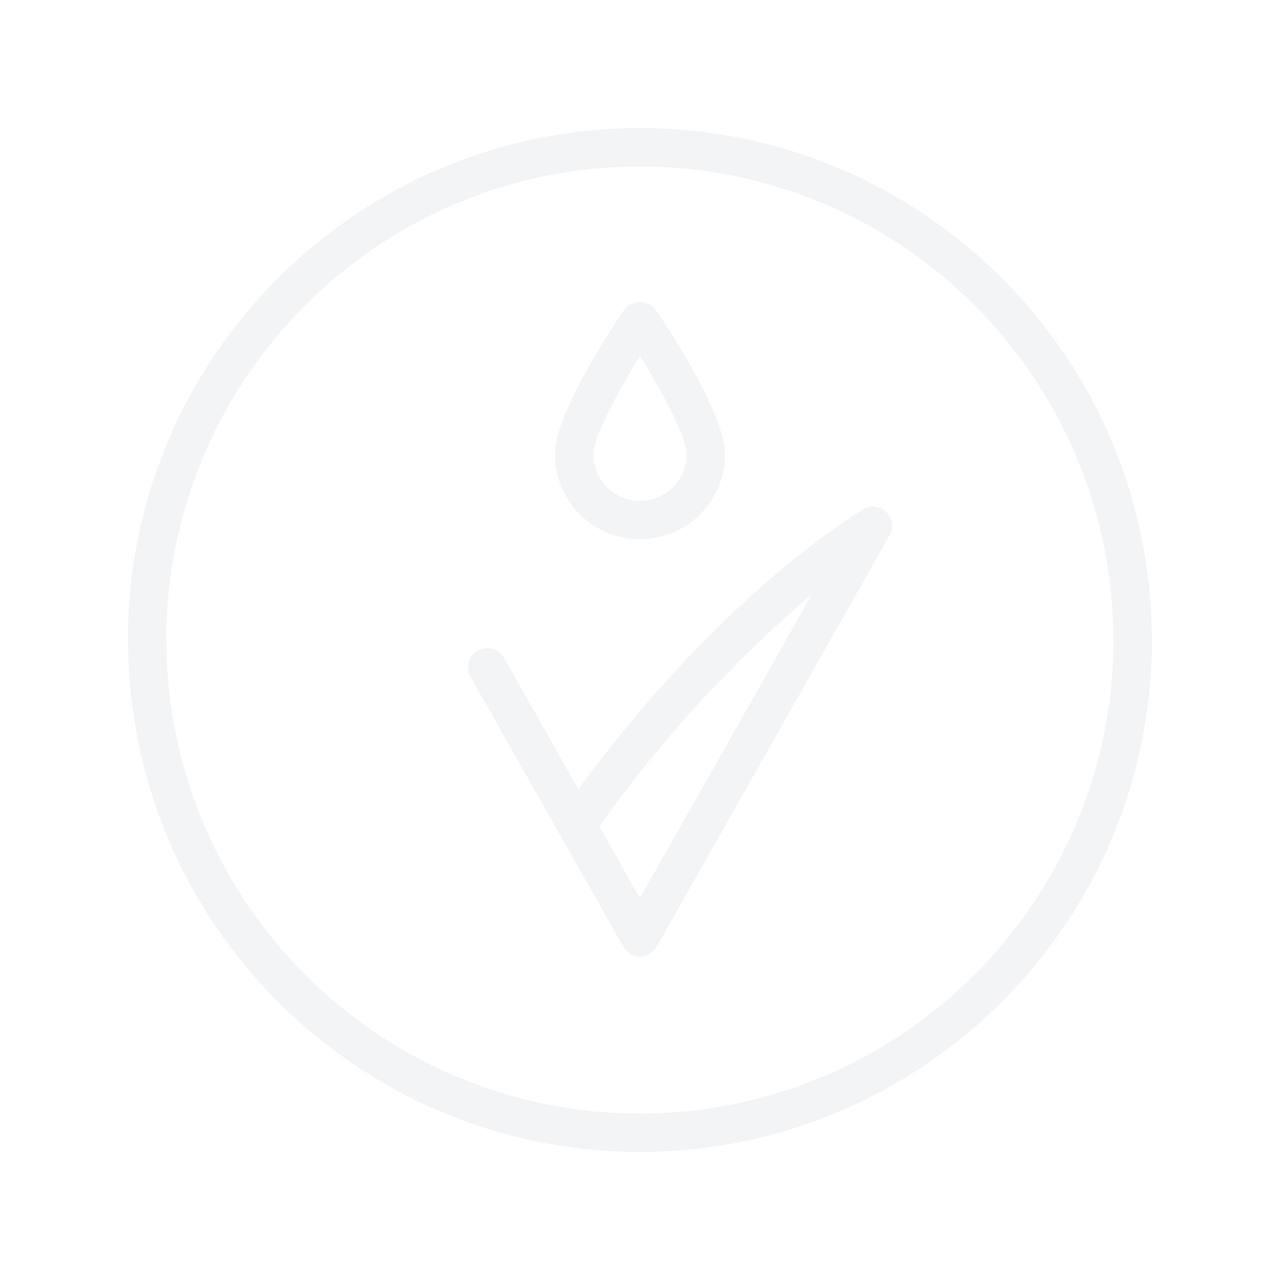 HOLIKA HOLIKA Holi Pop Lash Maker No.01 Volume Pop Up